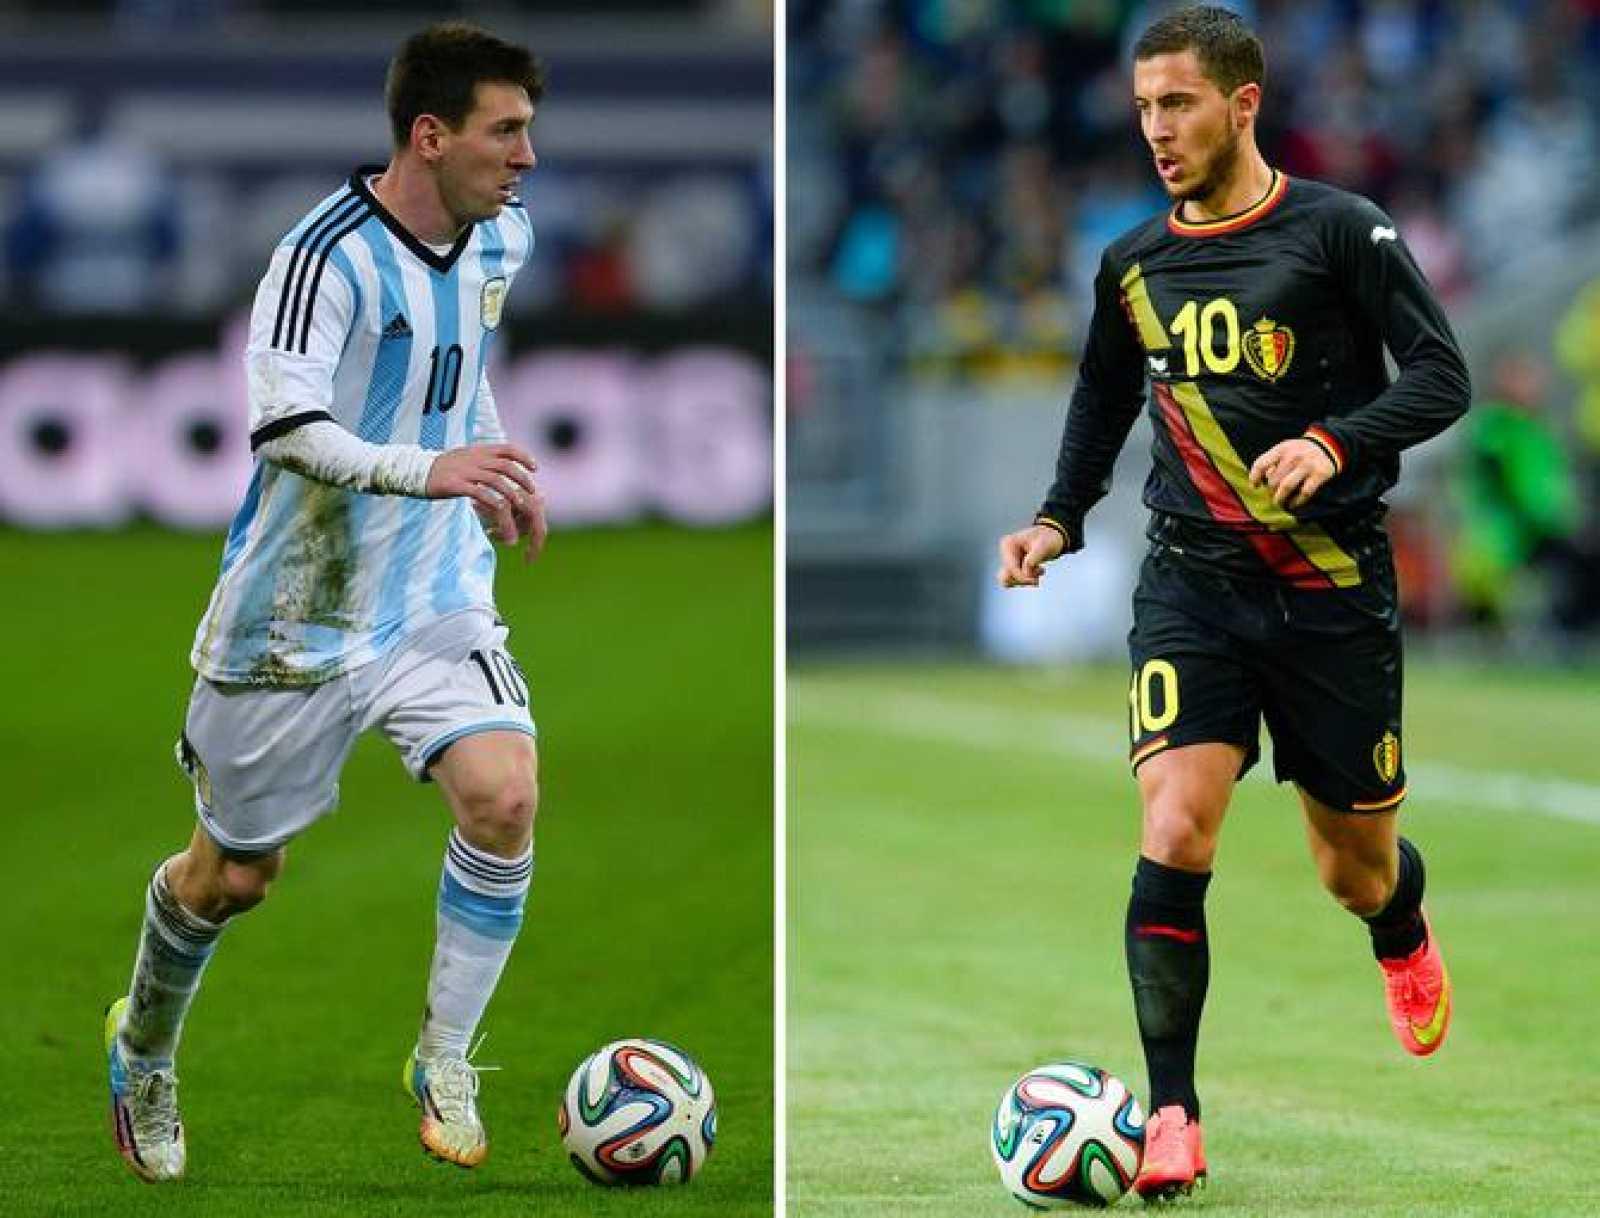 Mundial 2014 | Argentina - Bélgica | Argentina y Bélgica buscan las ...